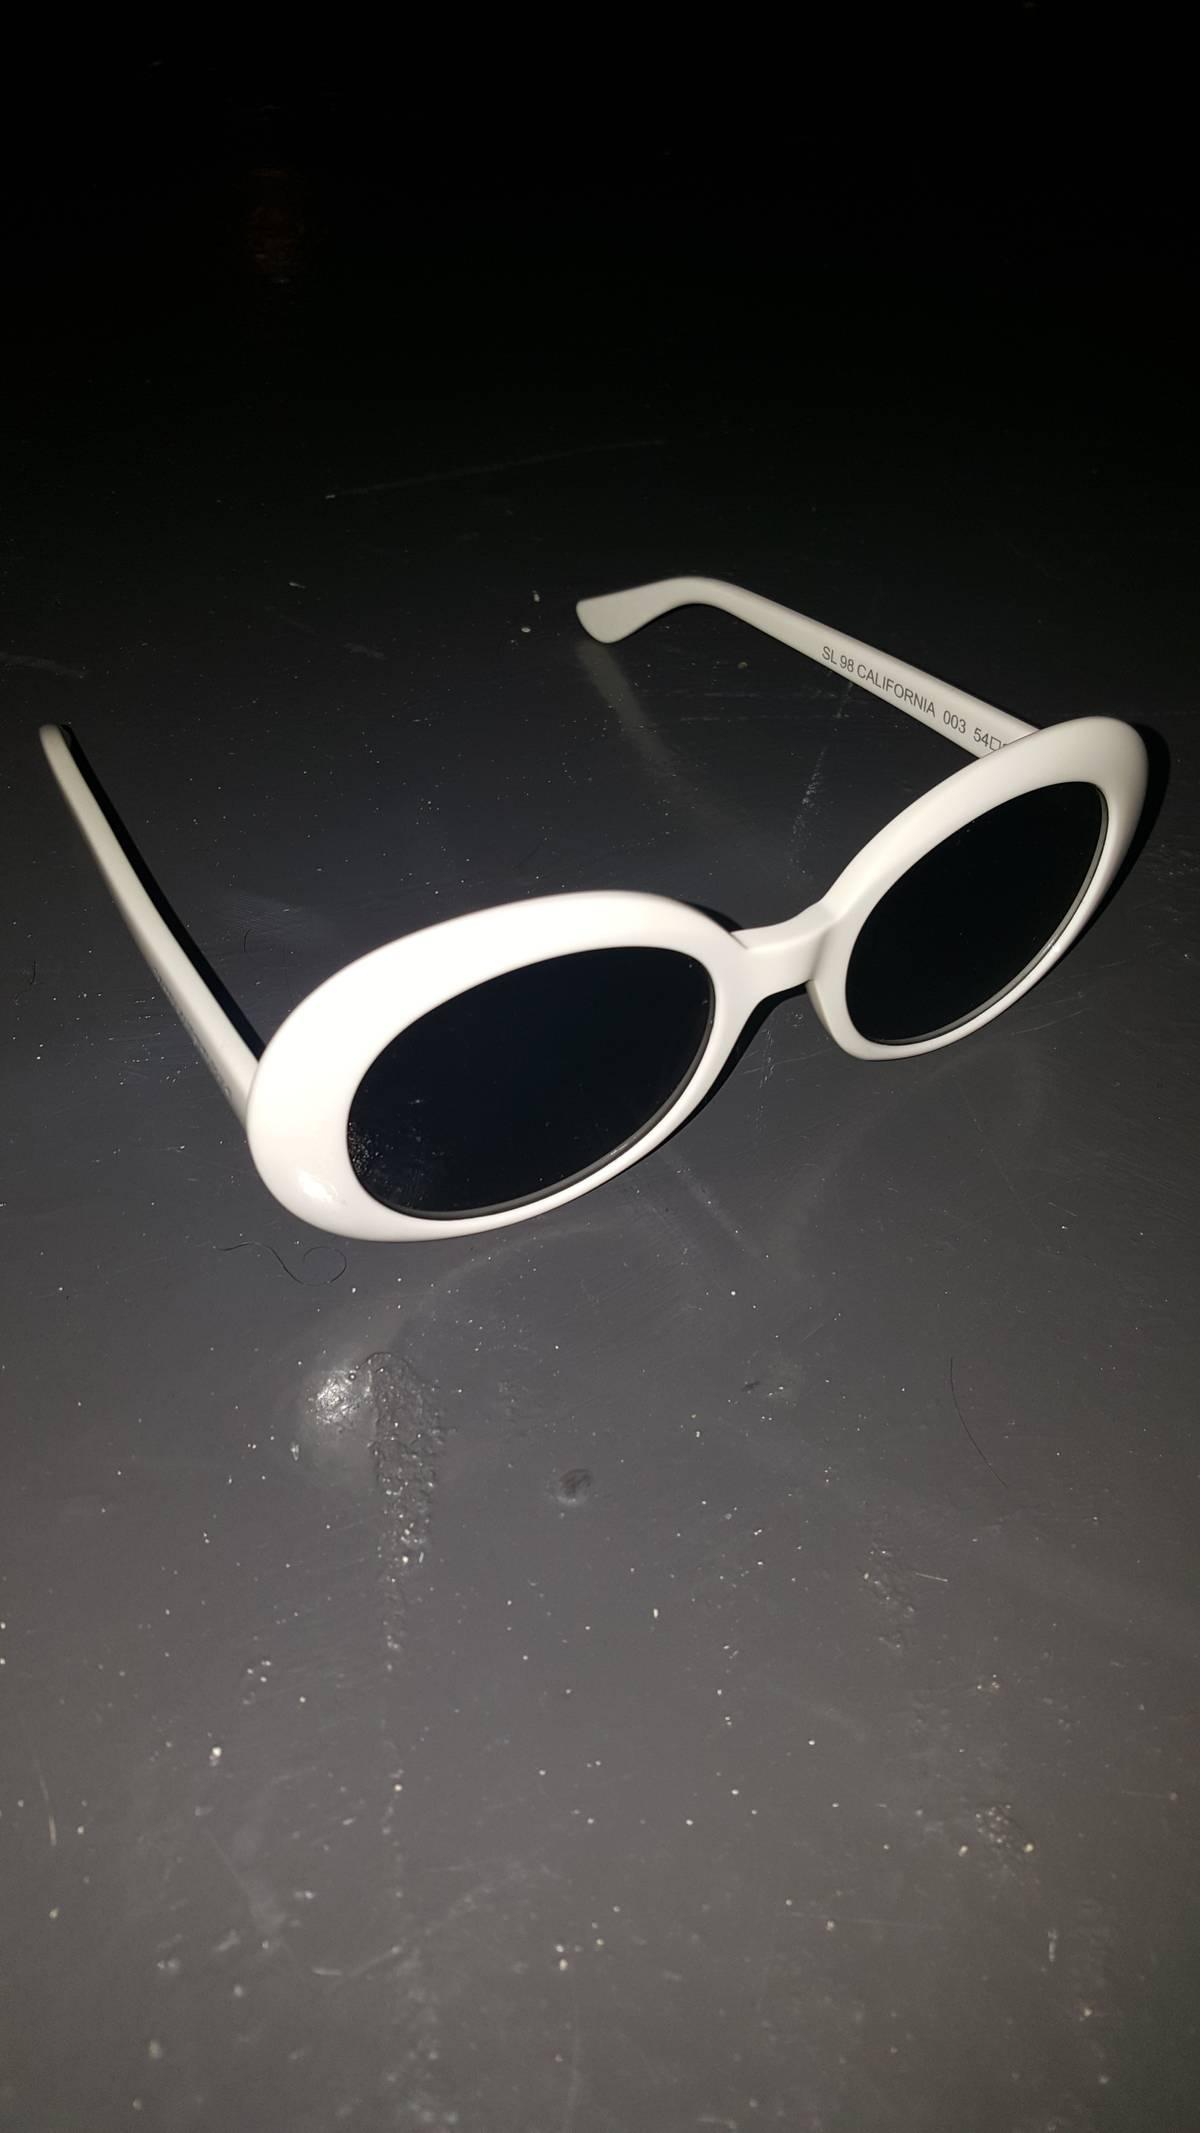 4261d780cc Yves Saint Laurent Sunglasses California 98 White Size one size ...